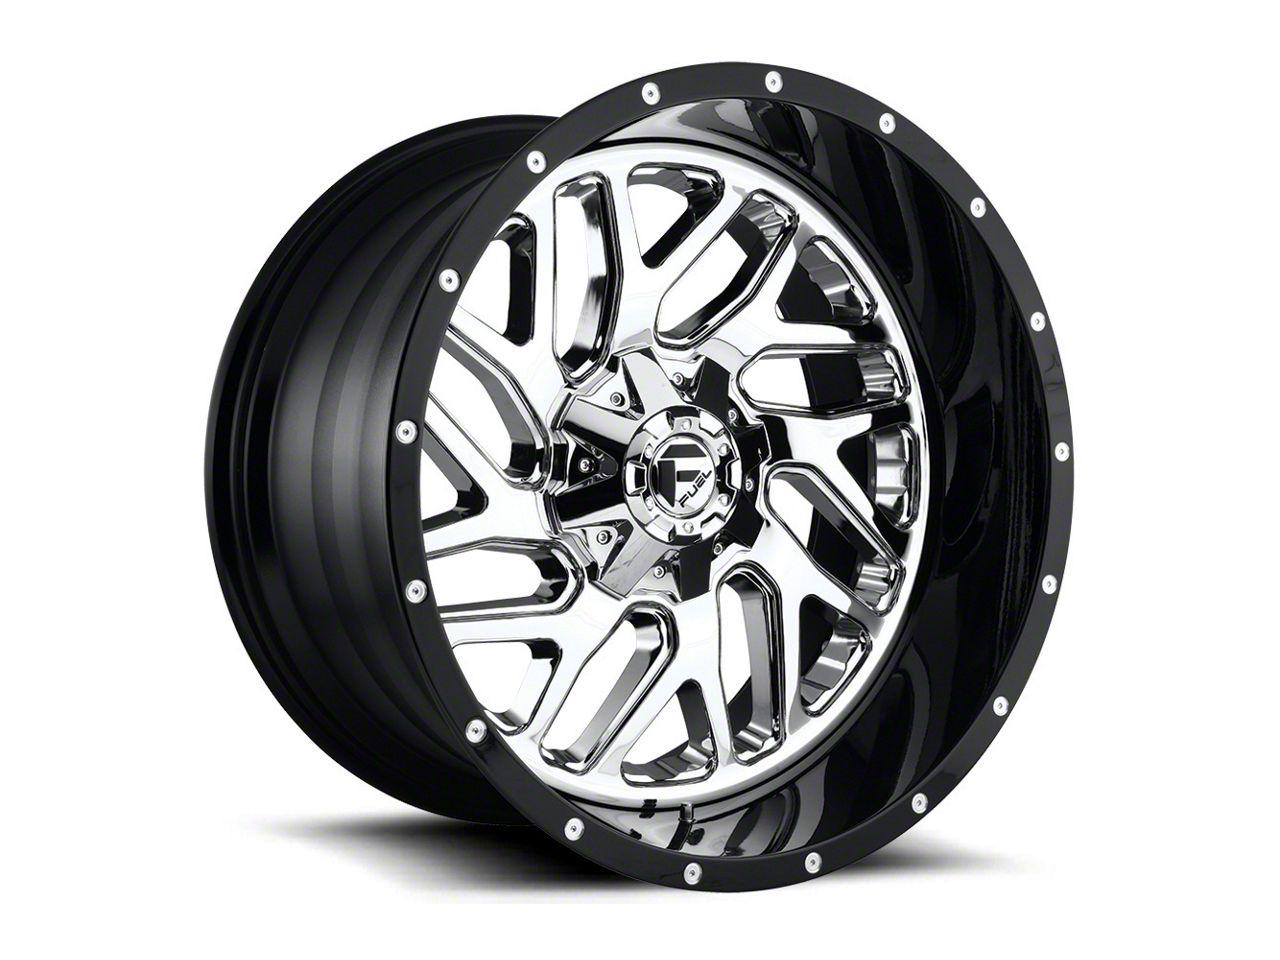 fuel wheels ram triton chrome 5 lug wheel 20x10 d21120007047 02 Lifted Dodge Cummins Mega Cab fuel wheels triton chrome 5 lug wheel 20x10 02 18 ram 1500